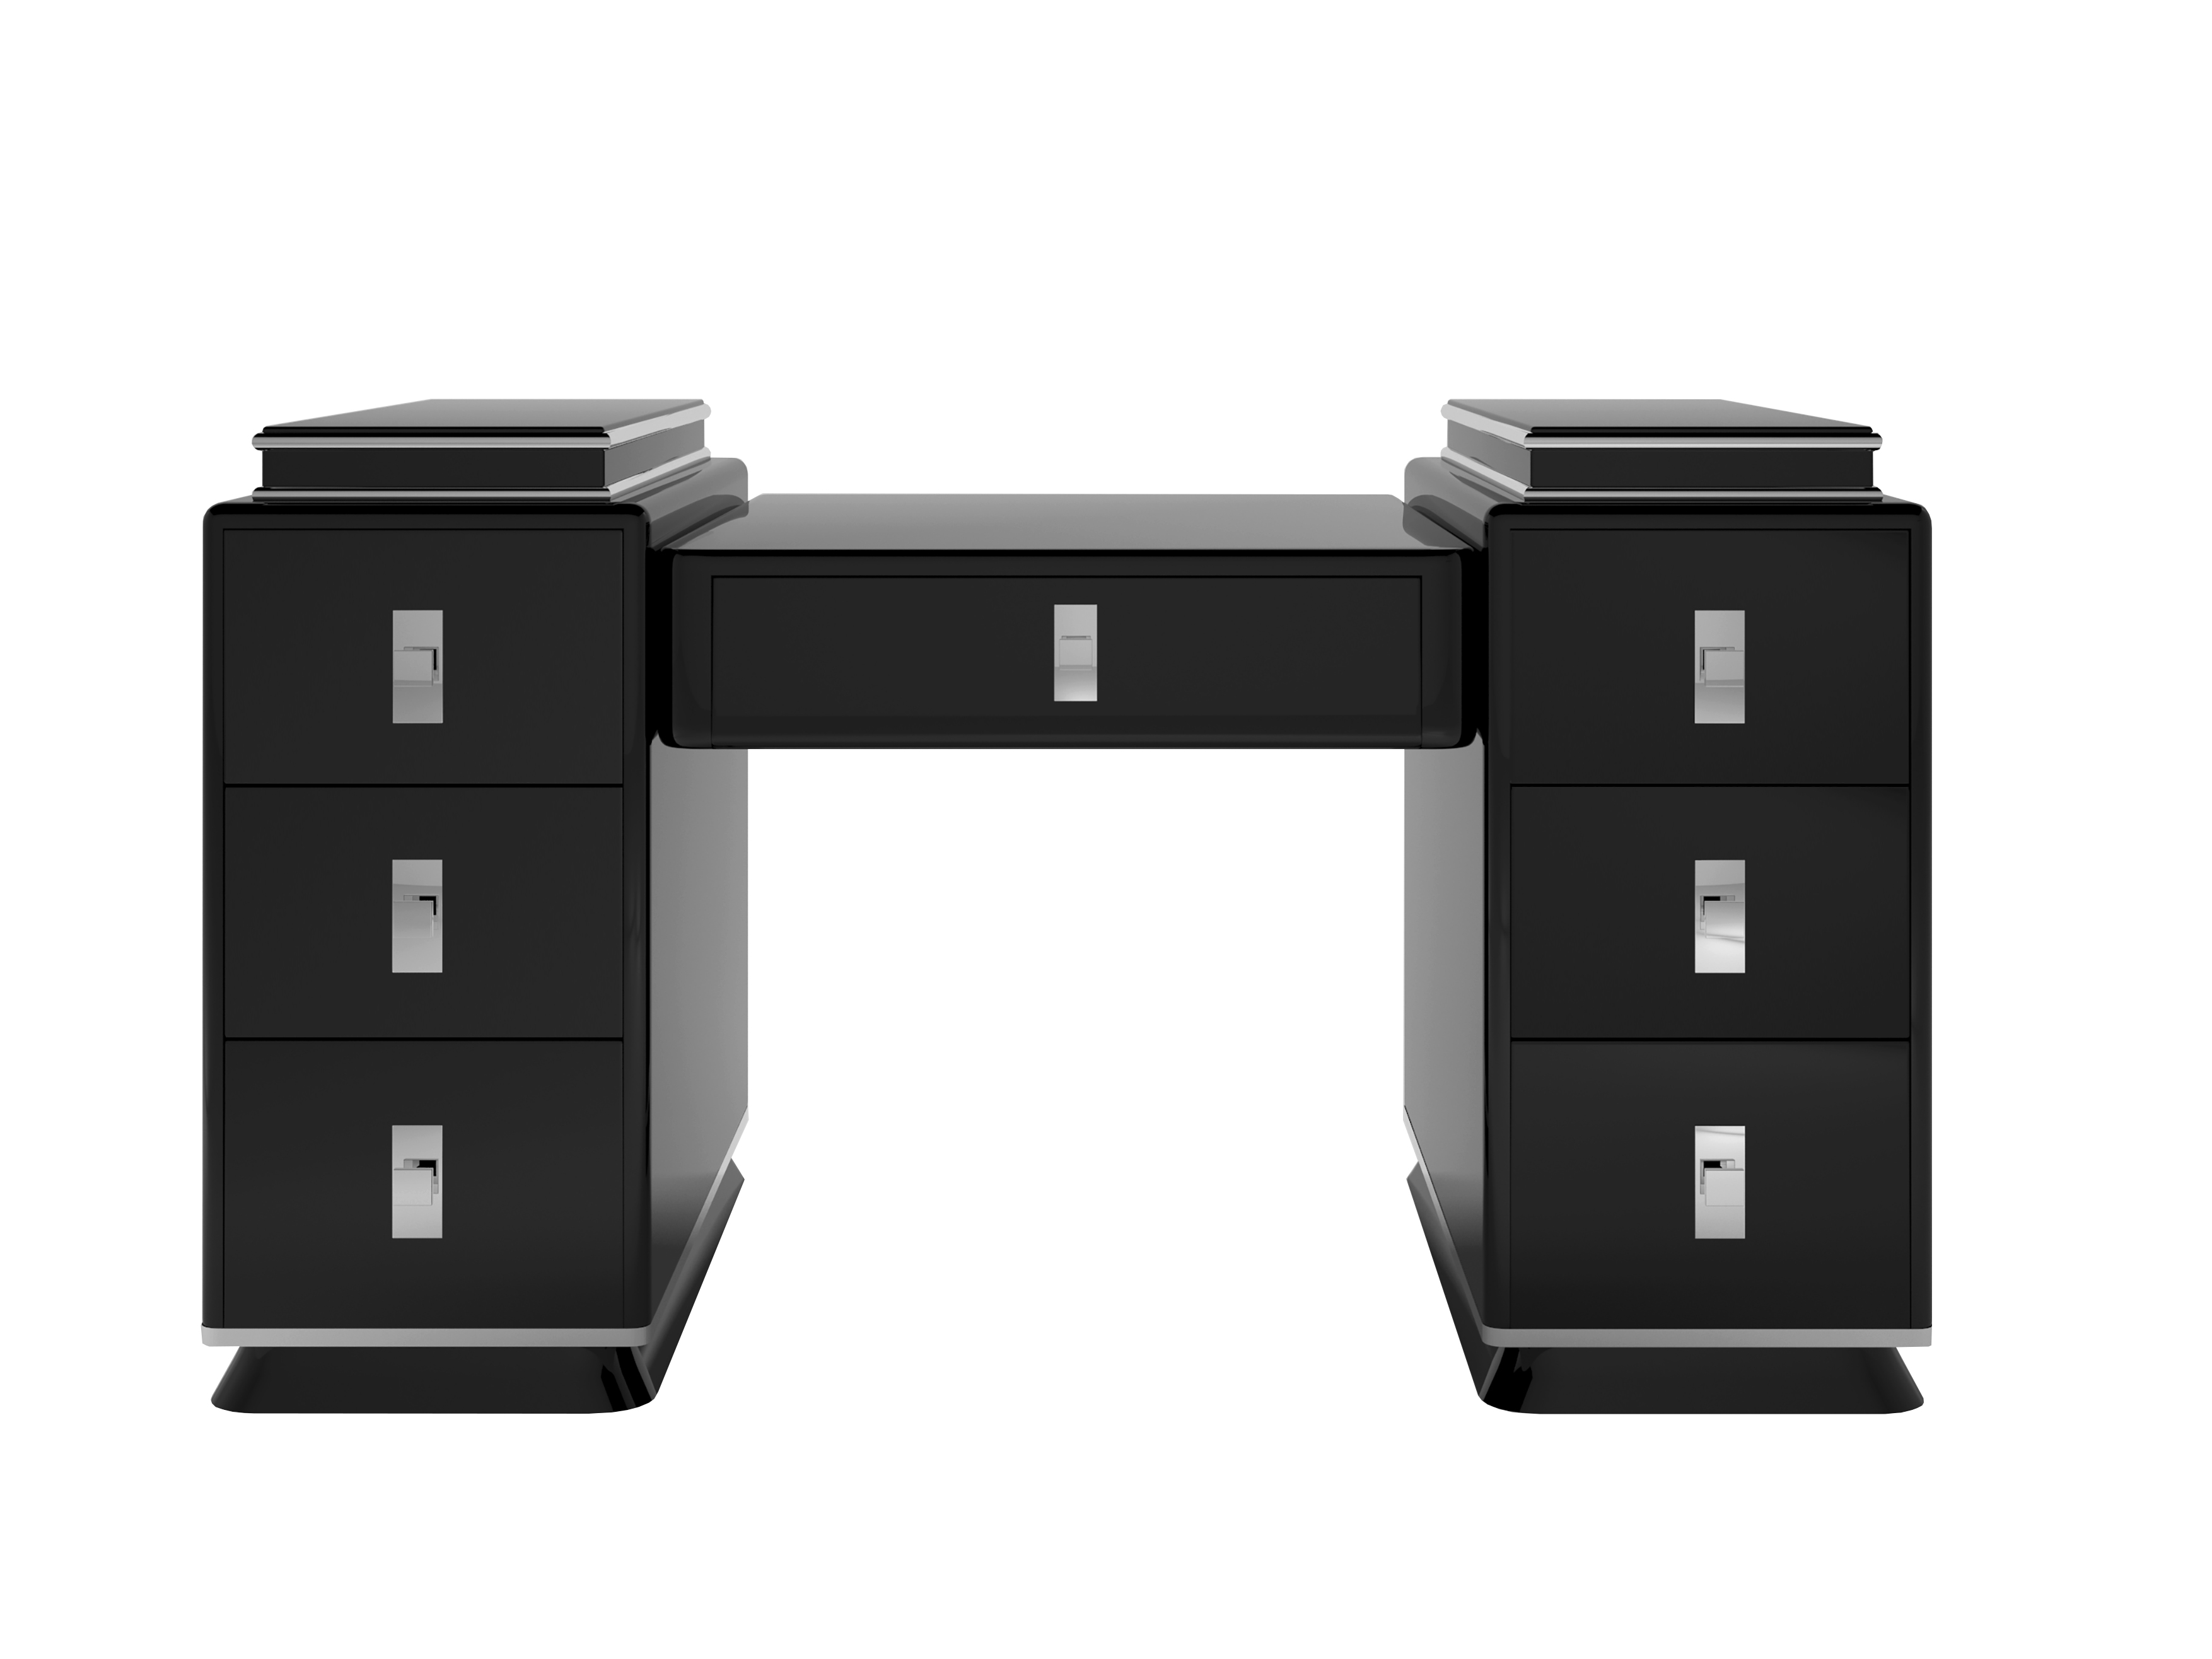 Modernist black art deco design tower desk unique interior design office furniture